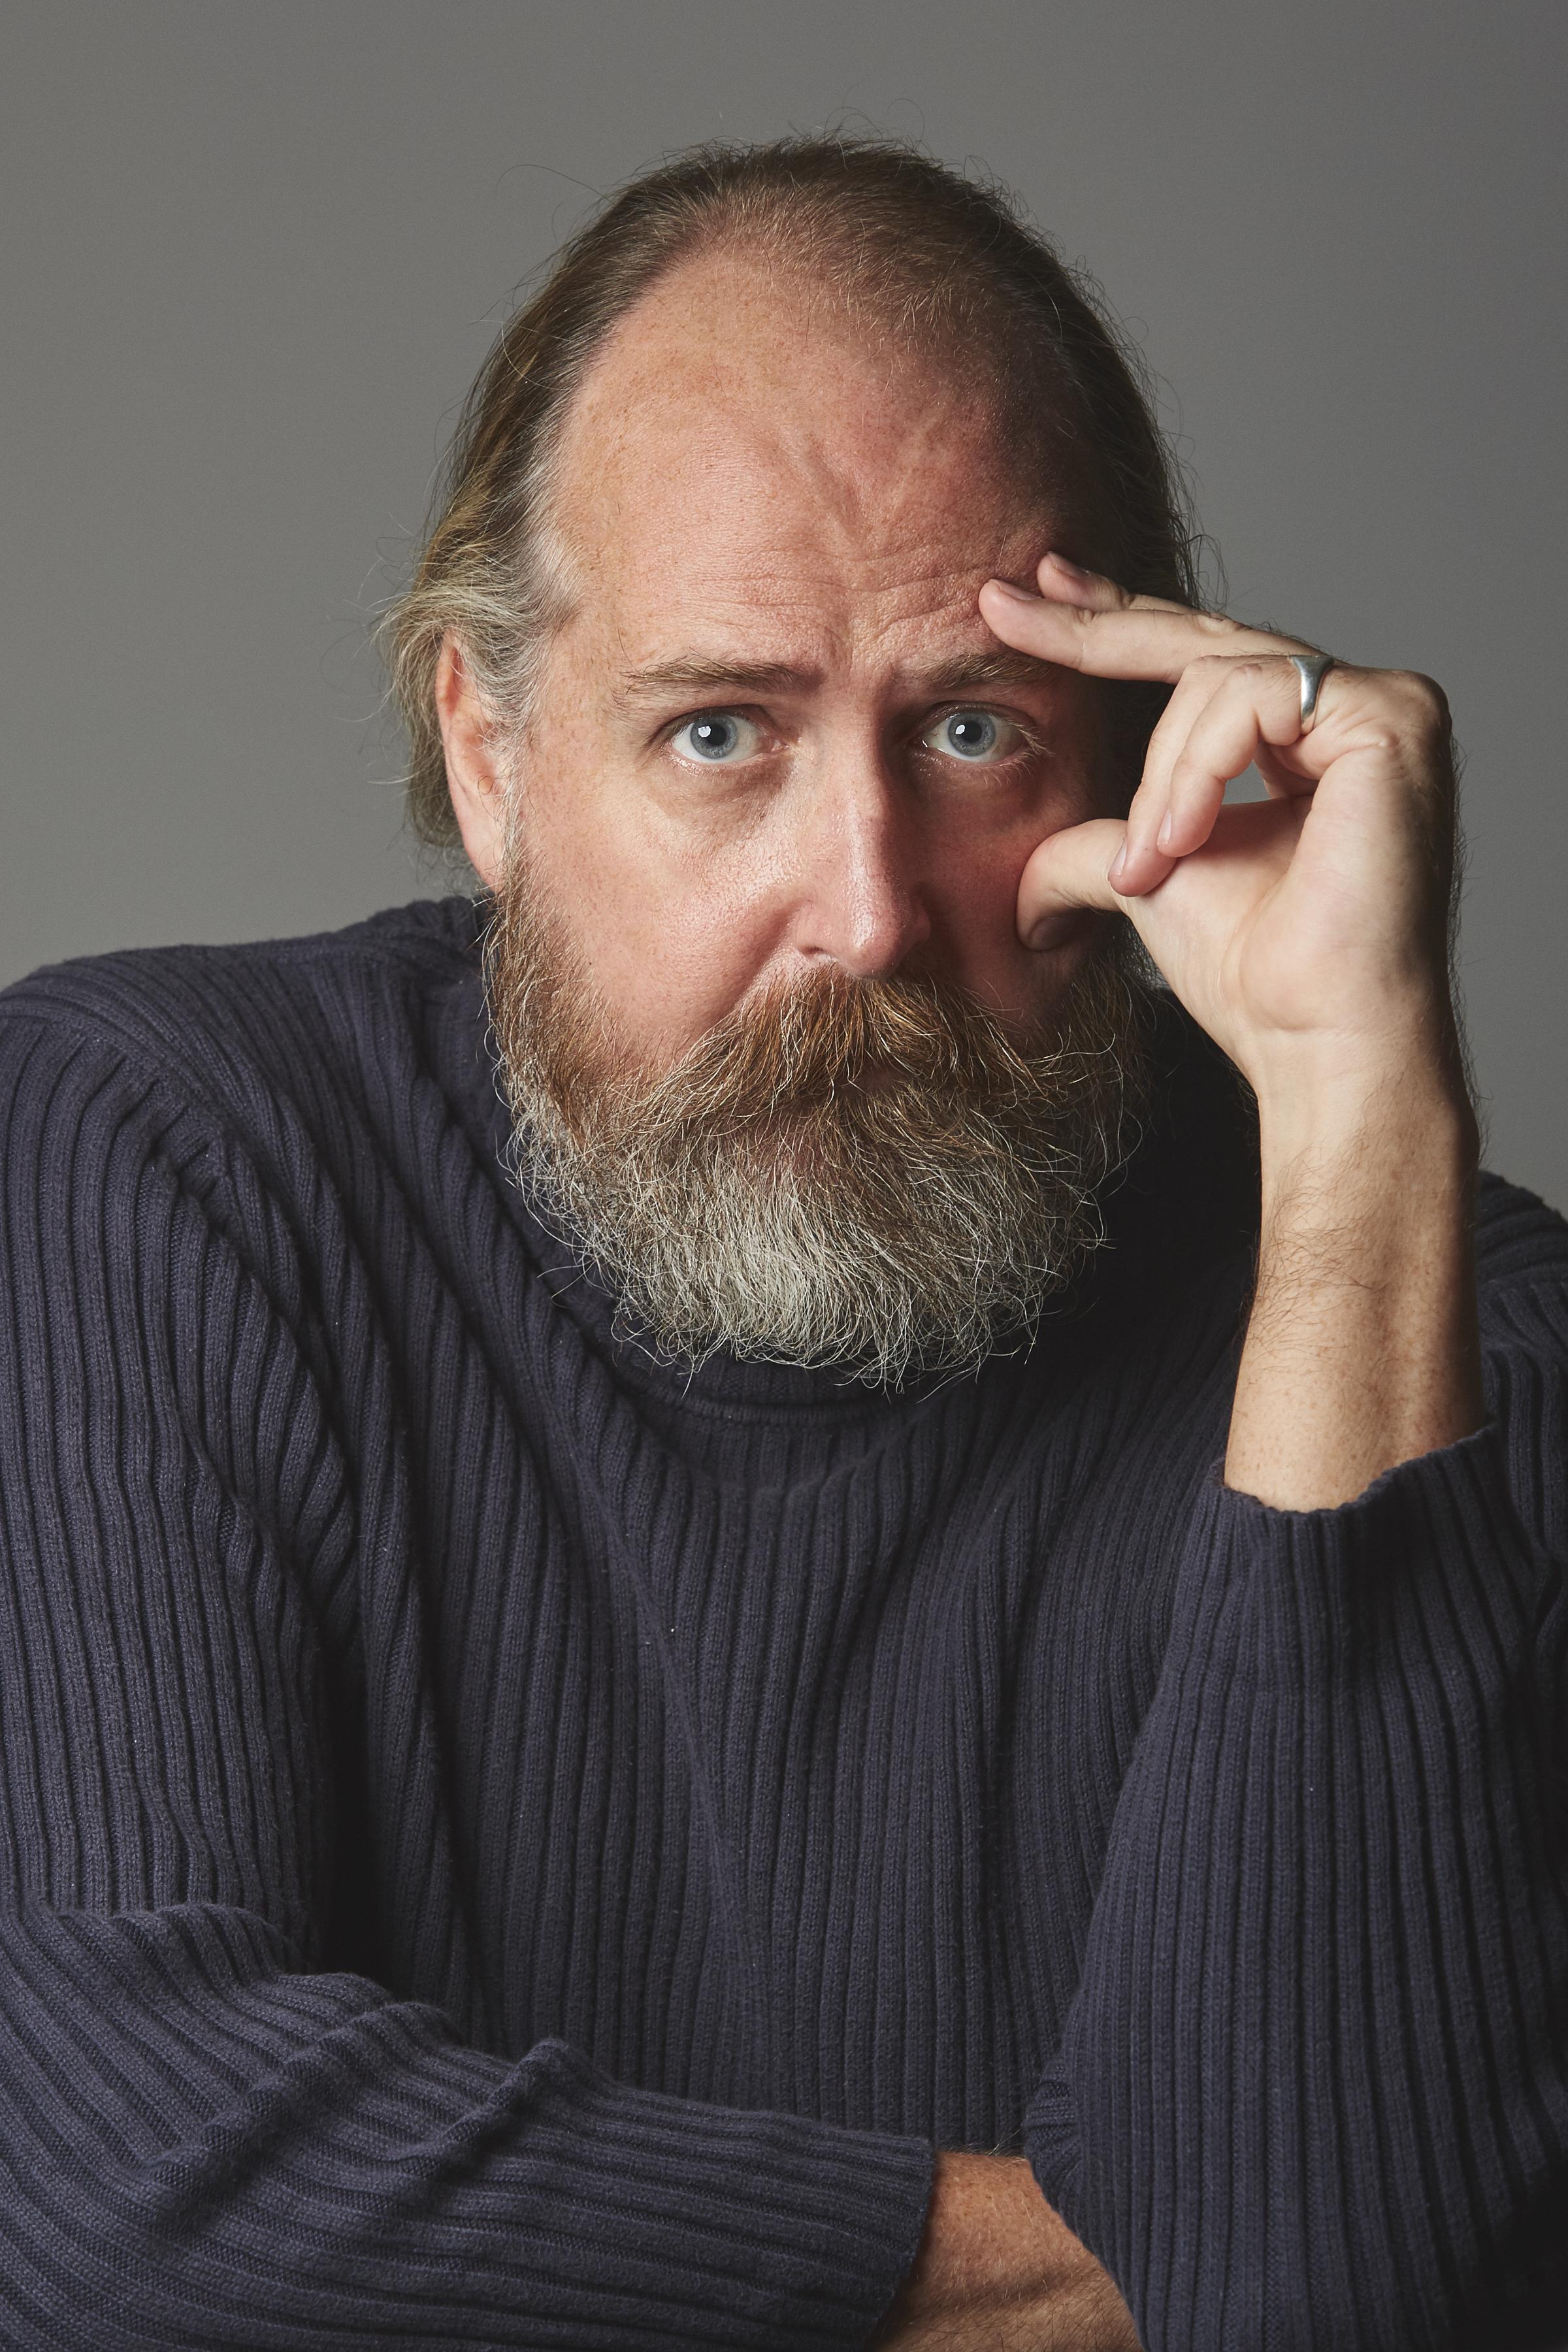 David Knijnenburg